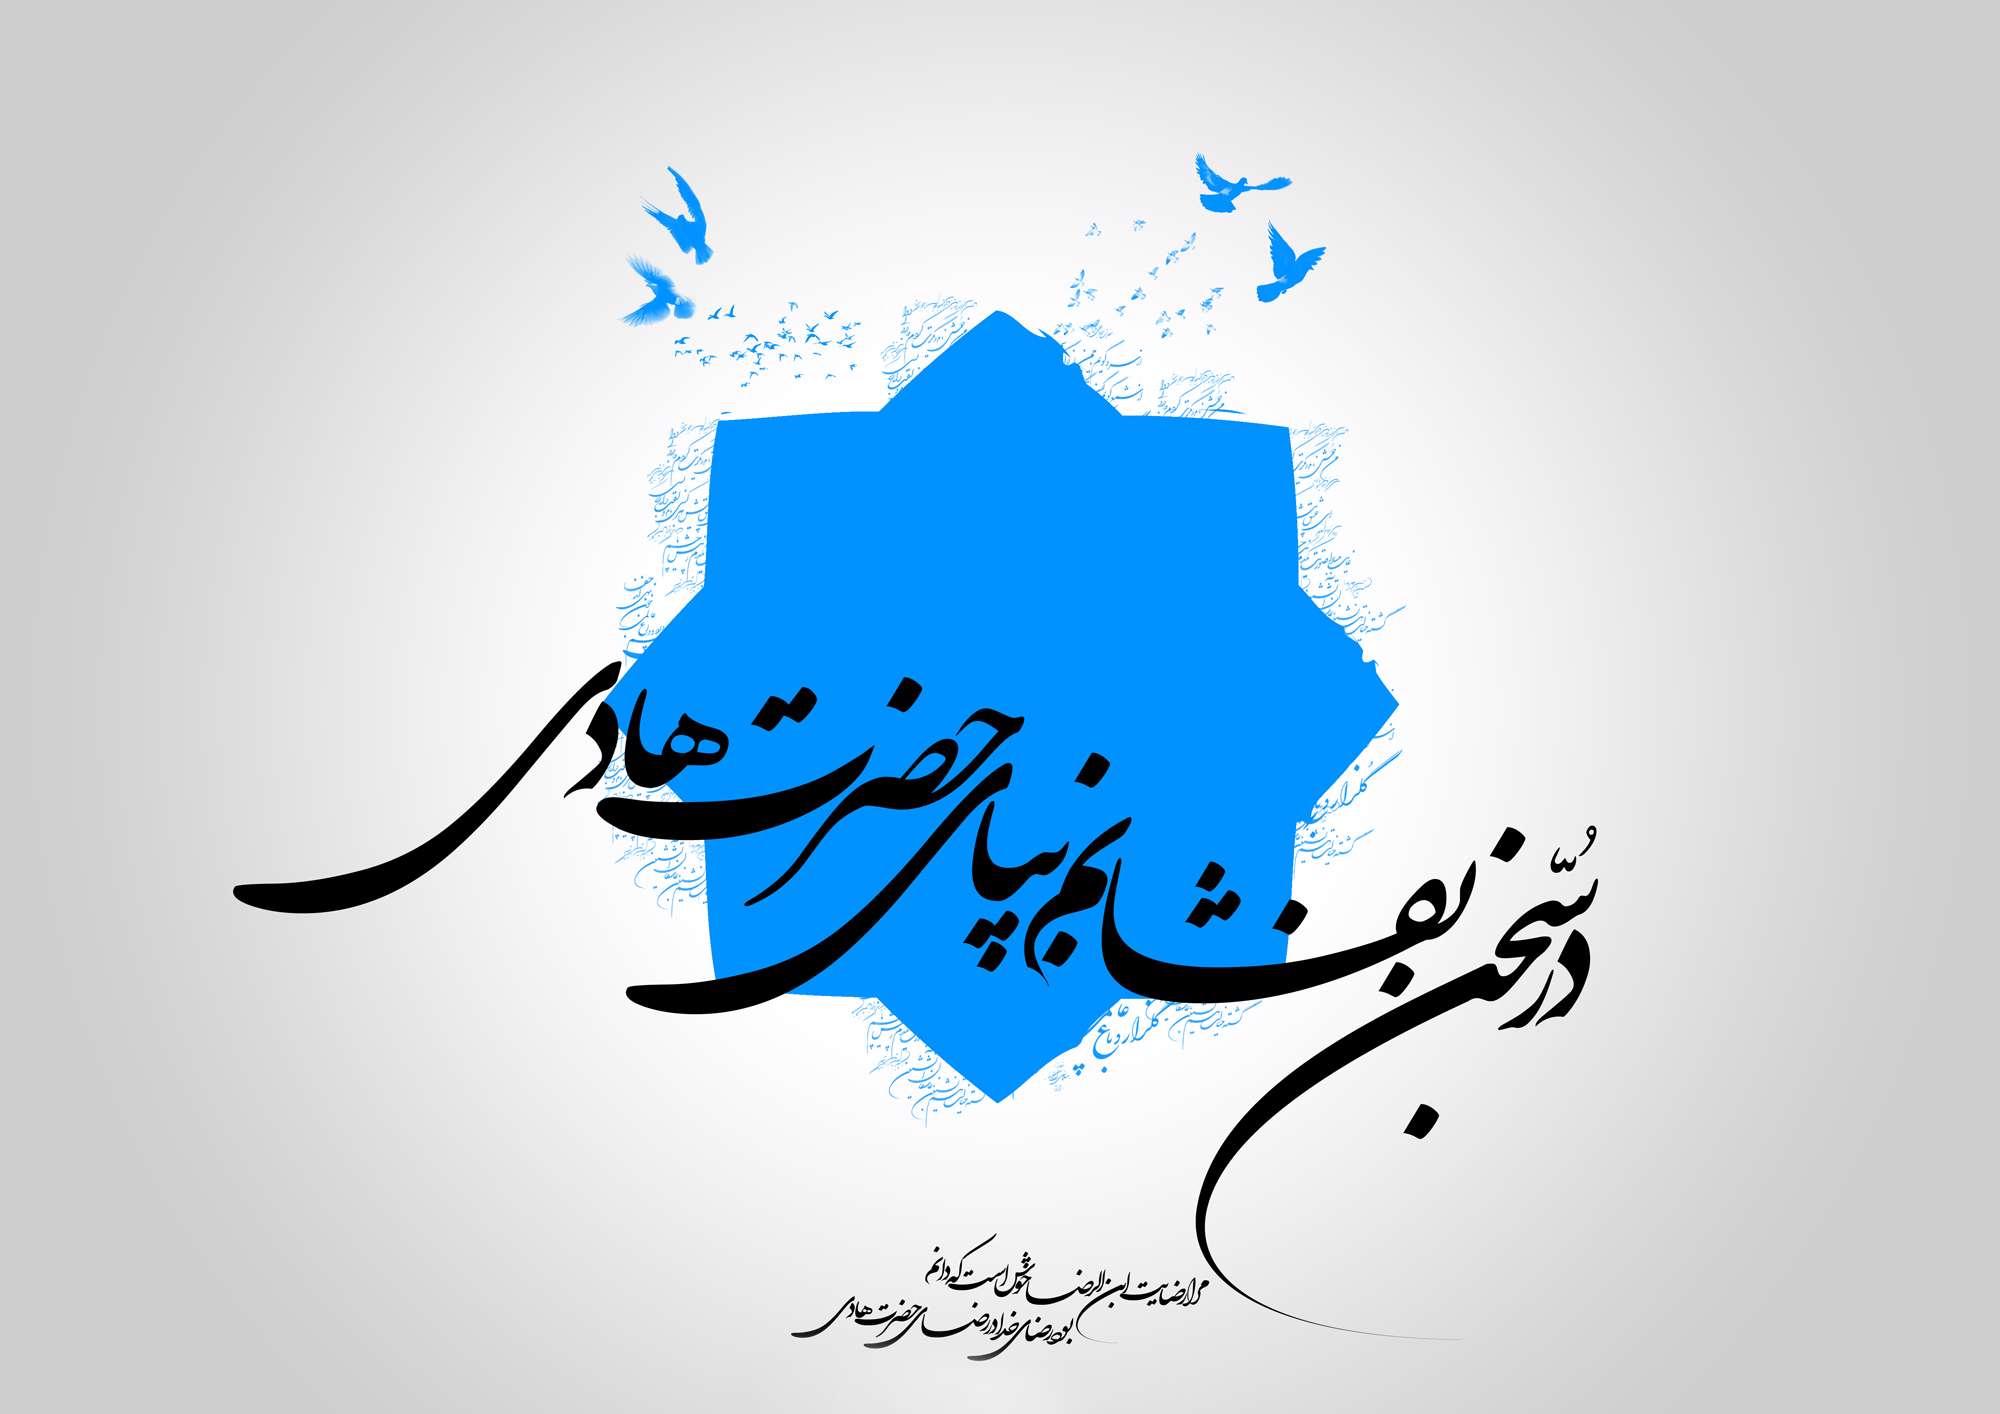 تم ویندوز سون مزین به احادیثی از امام نقی علیه السلام، سری دوم